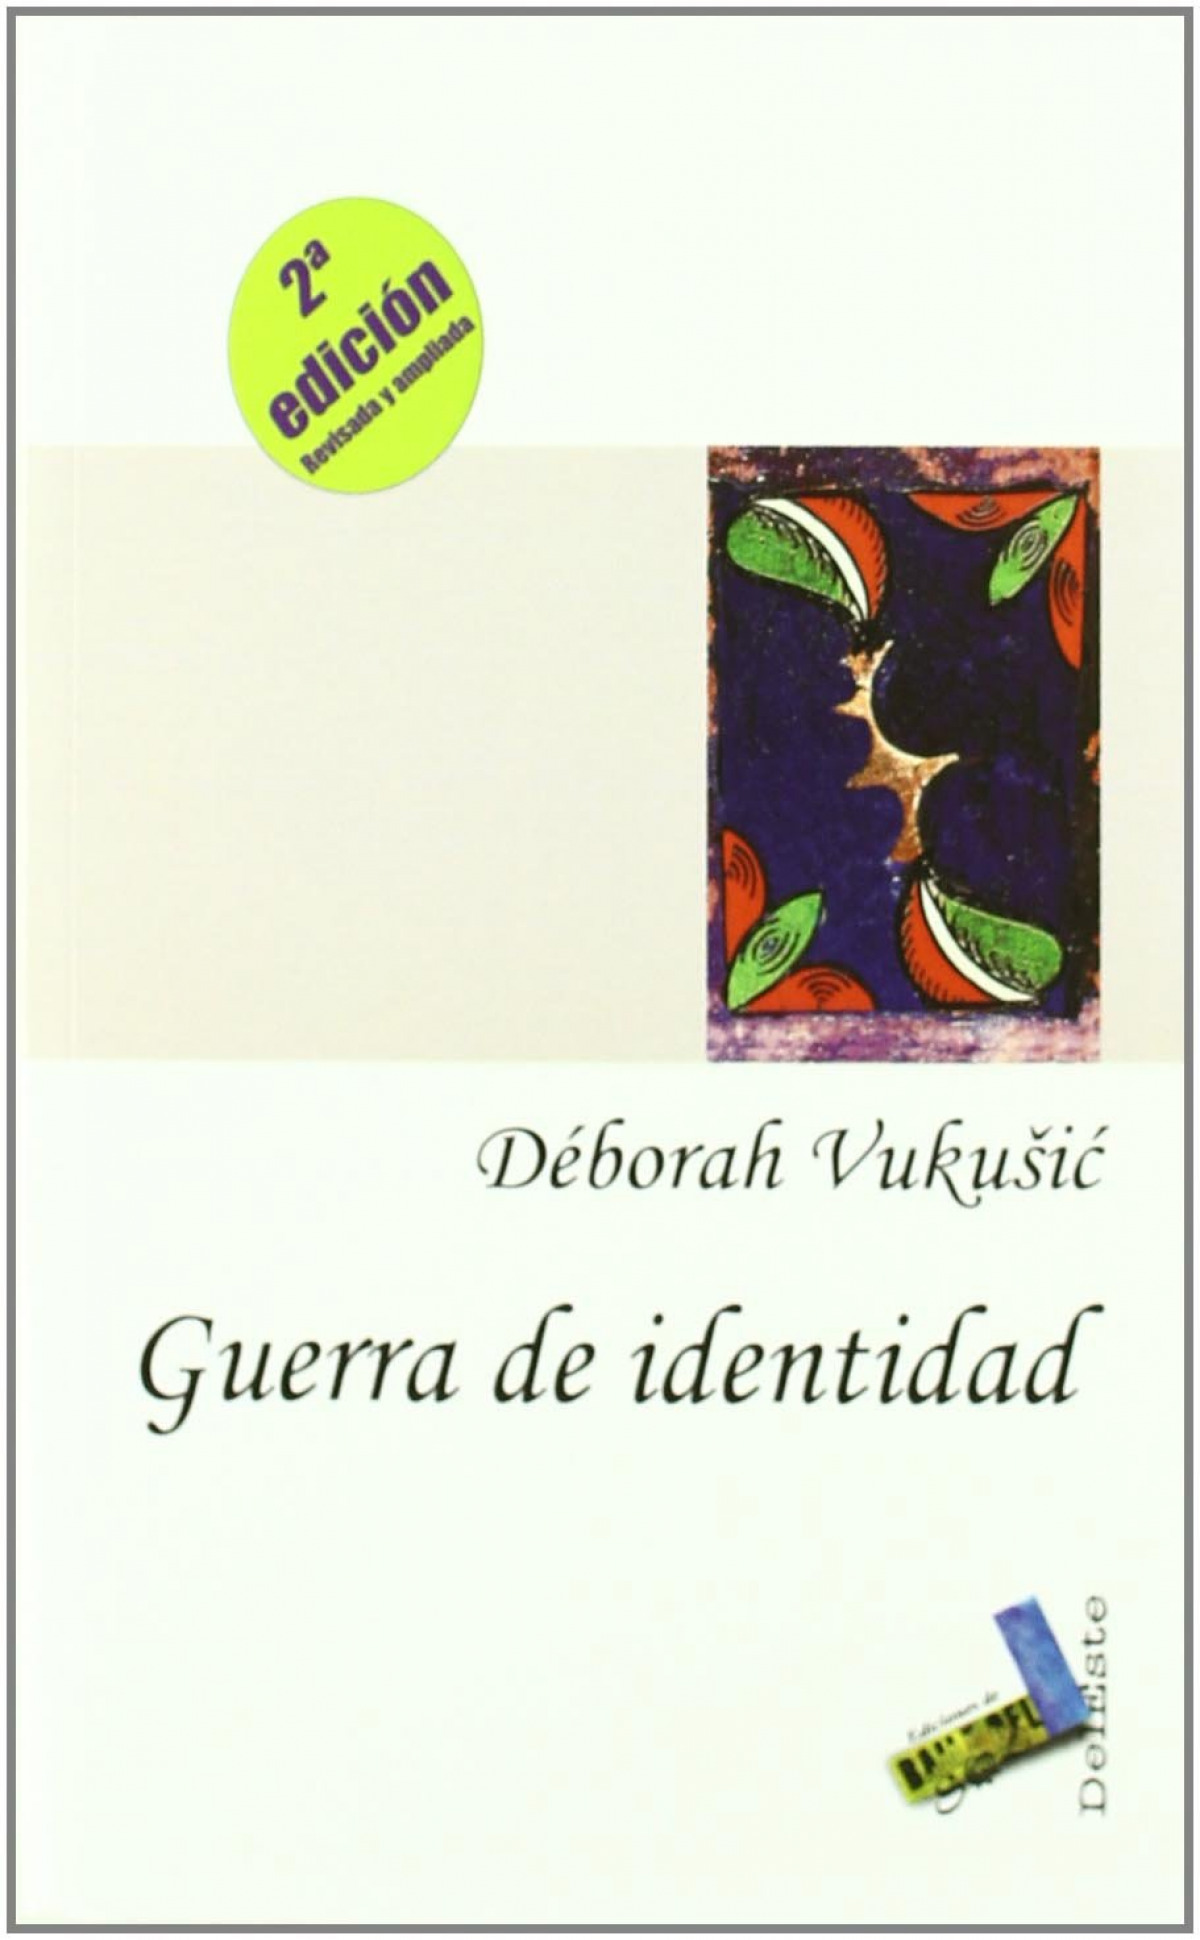 Guerra de identidad - Vukusic, Déborah